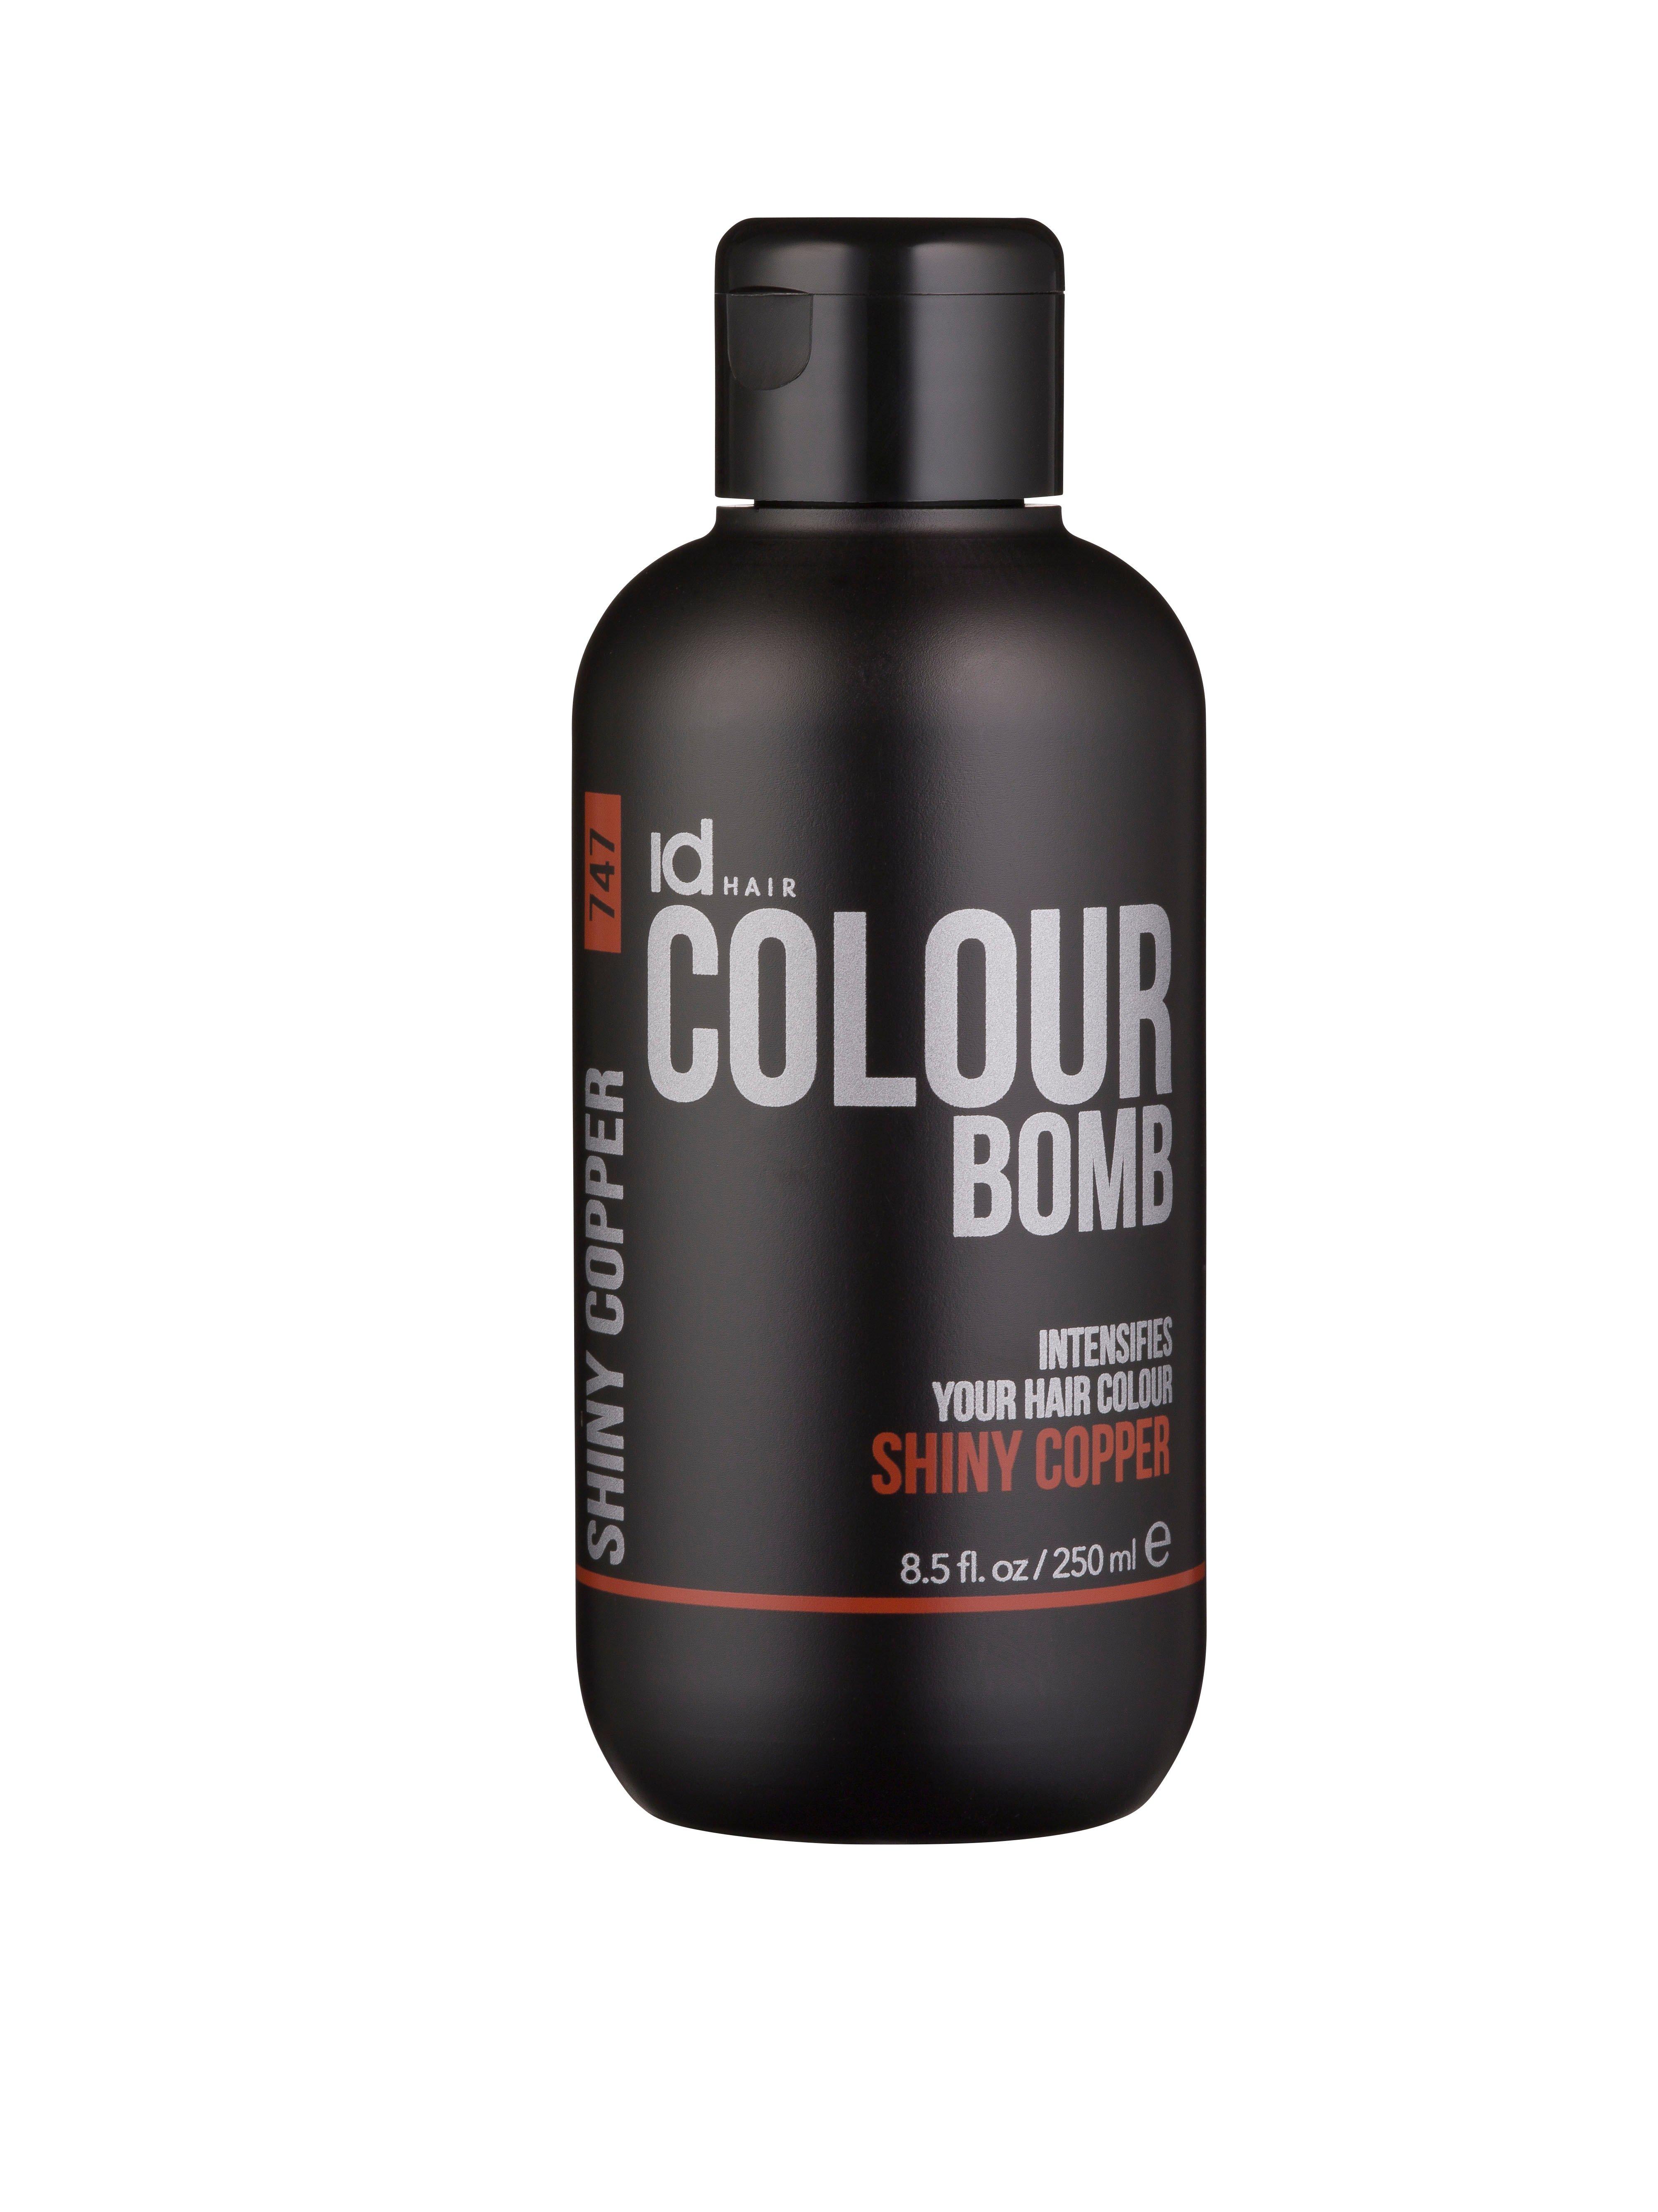 IdHAIR - Colour Bomb 250 ml - Shiny Copper